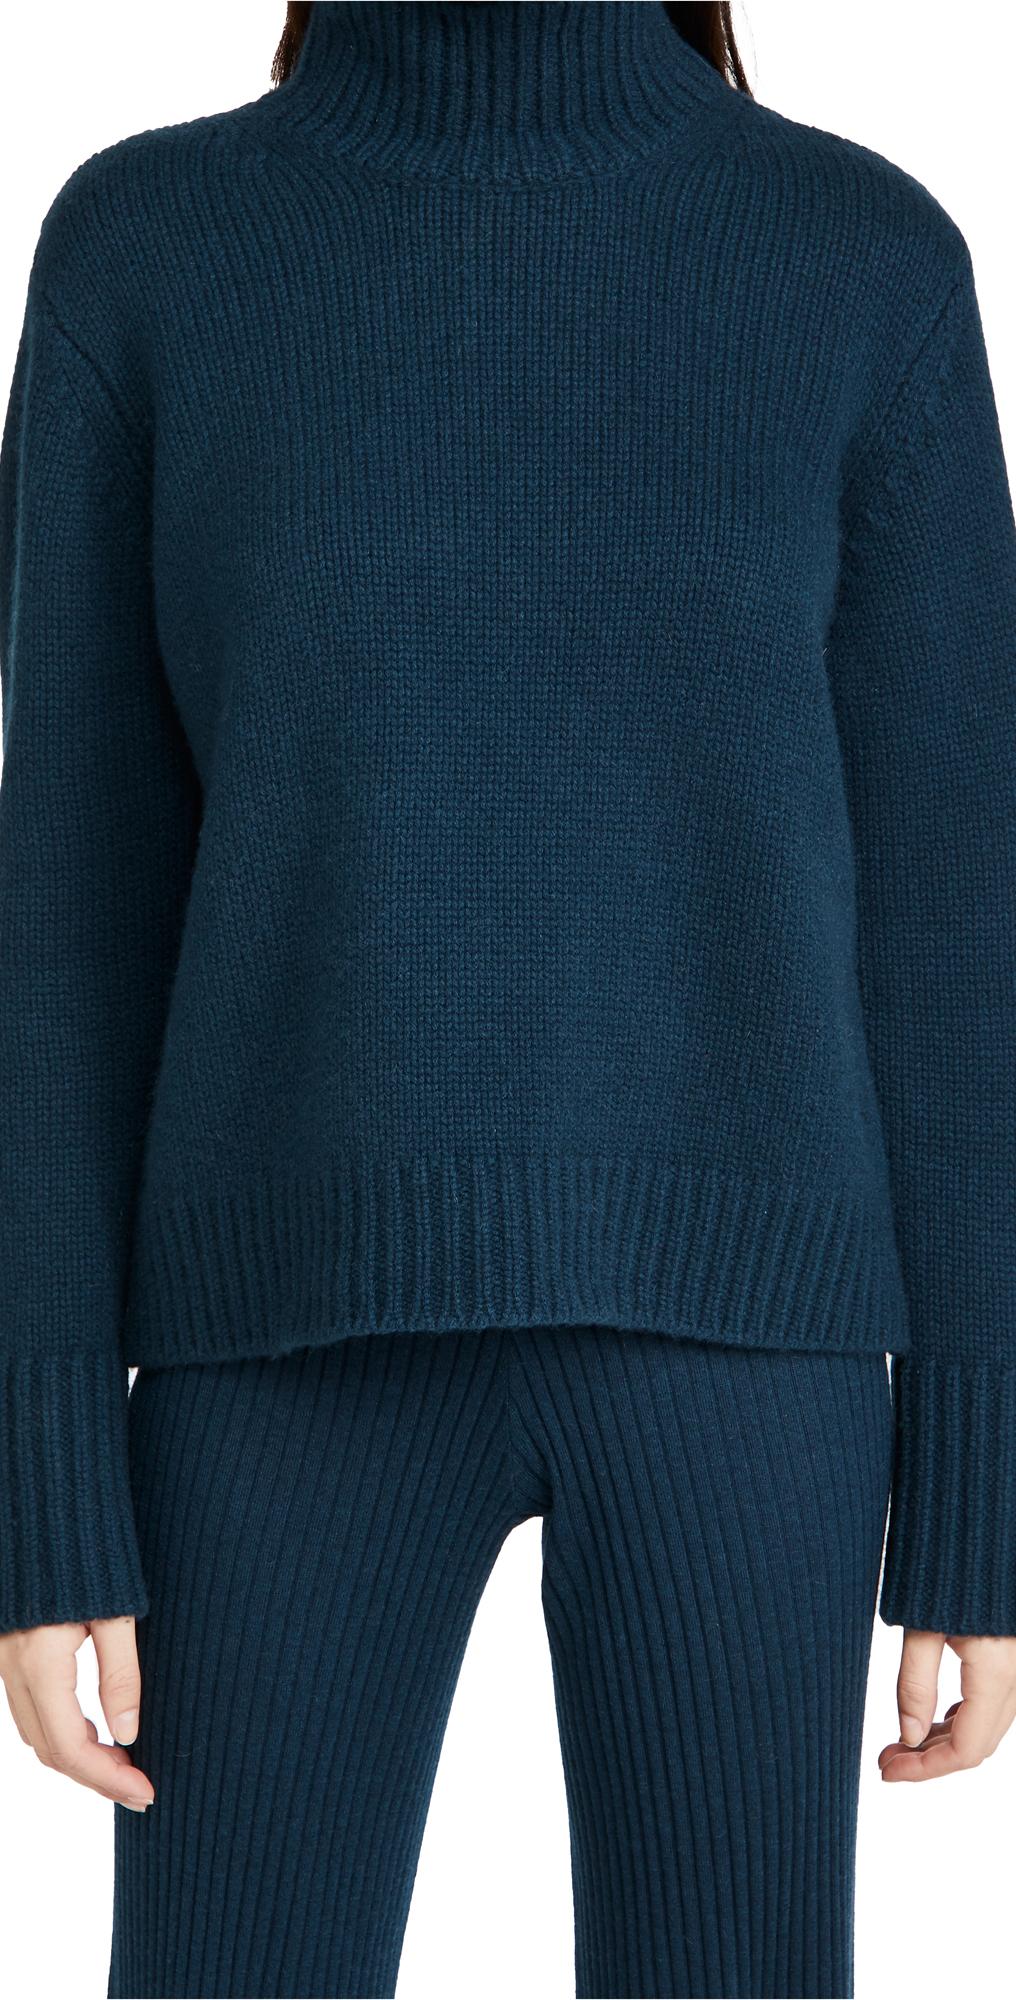 Sablyn Sawyer Cashmere Sweater